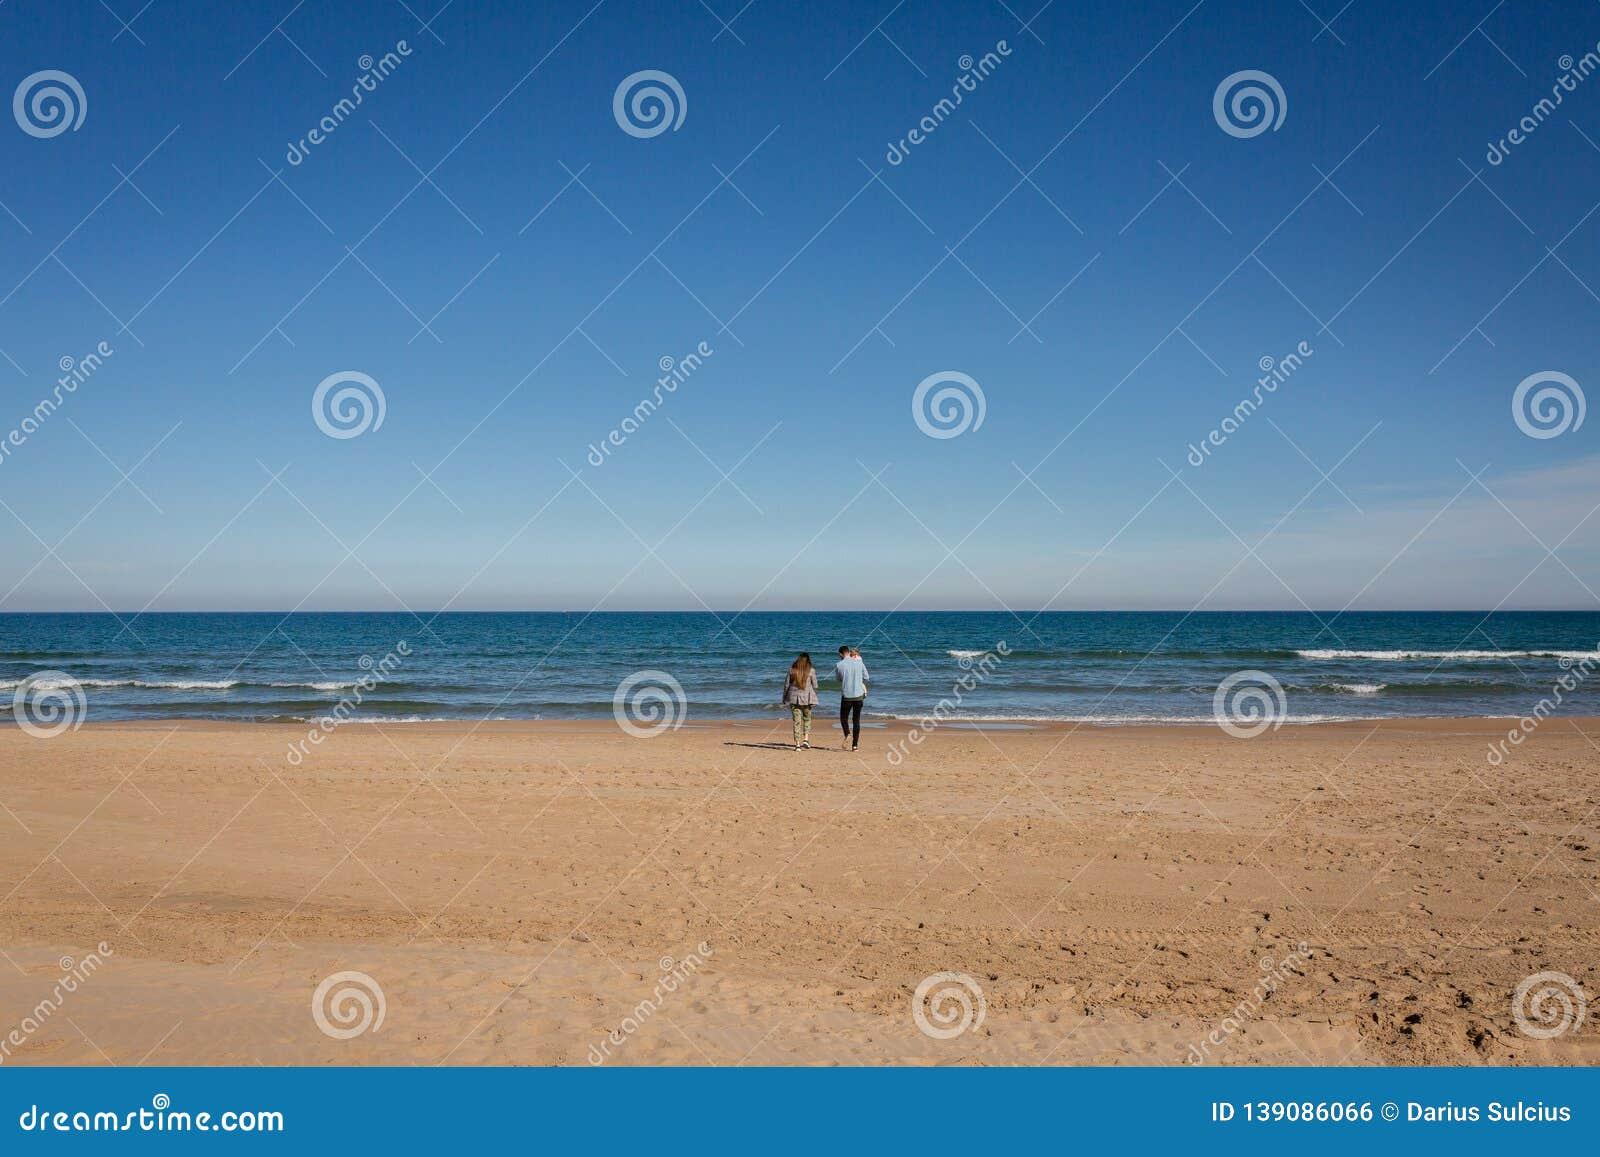 Young family walking in empty beach Gandia, Spain